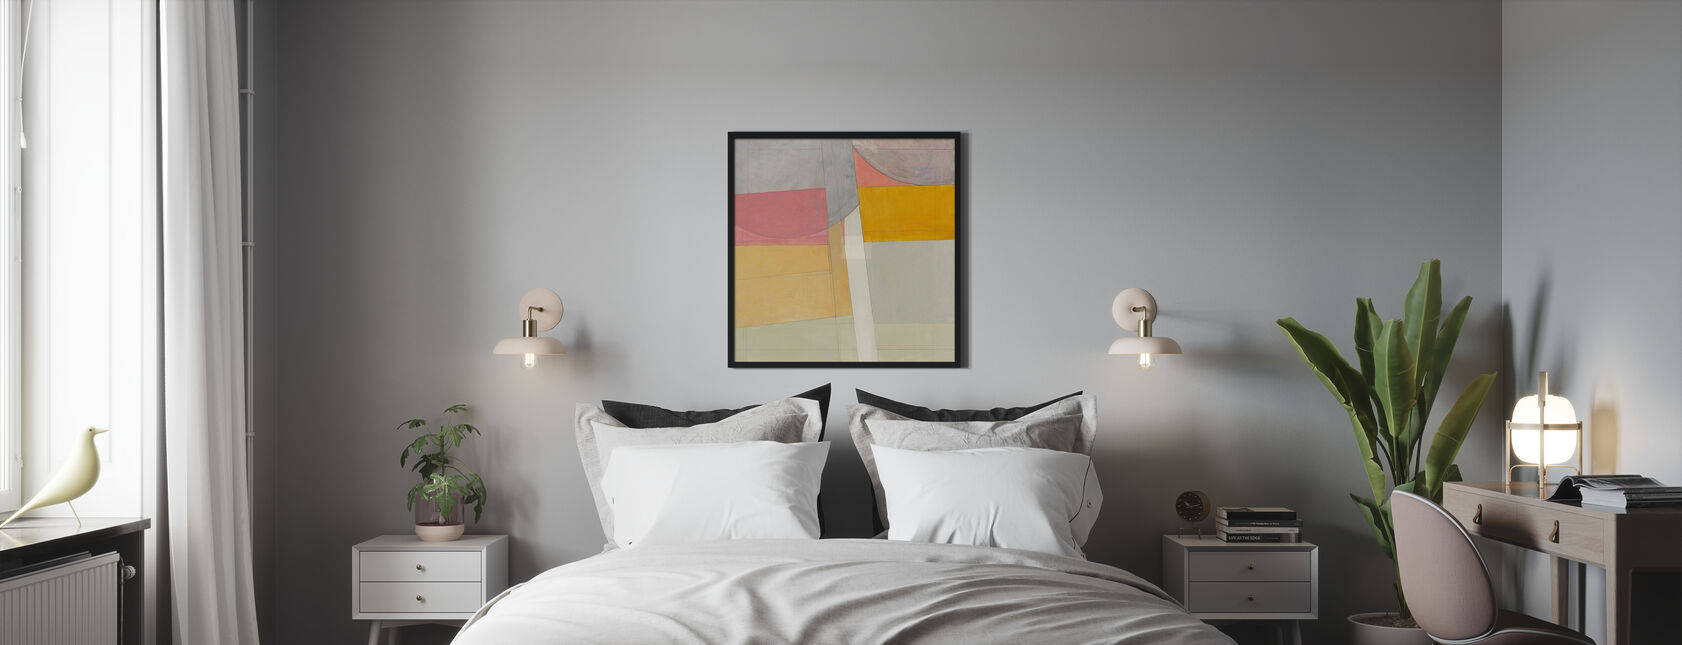 Sunny Side Up - Poster - Bedroom